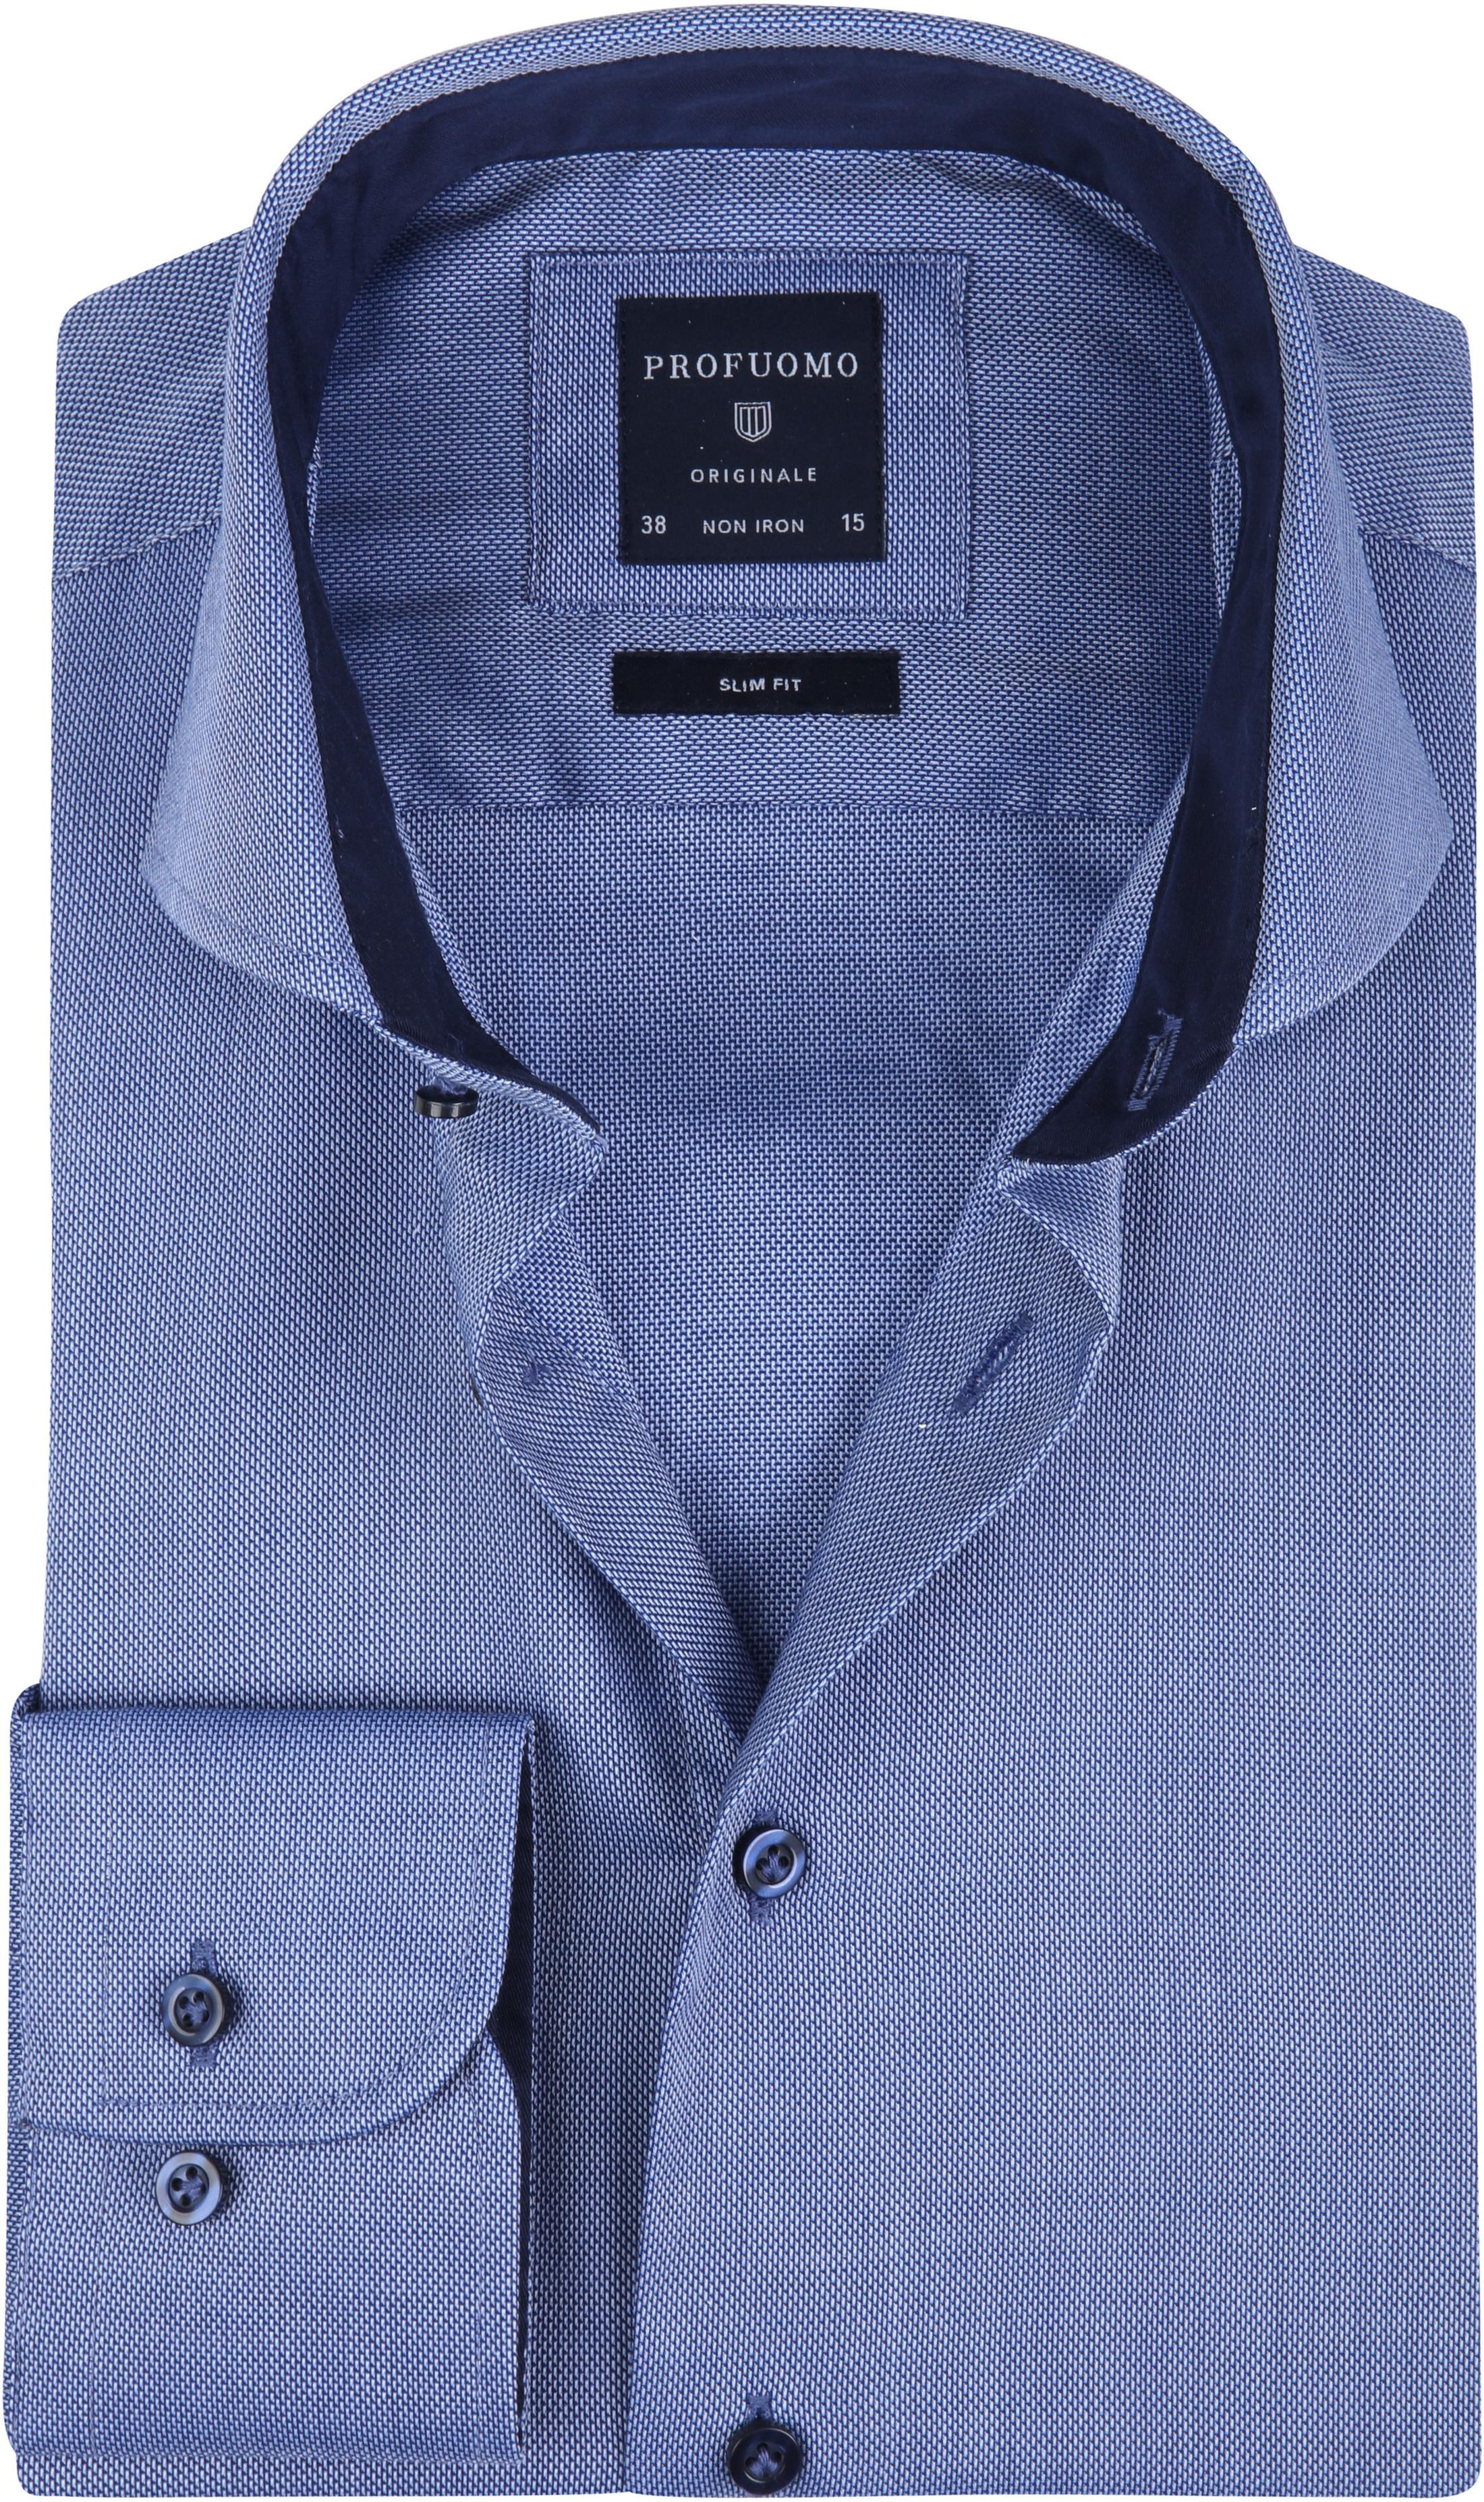 Profuomo Overhemd SF Non Iron Blauw foto 0